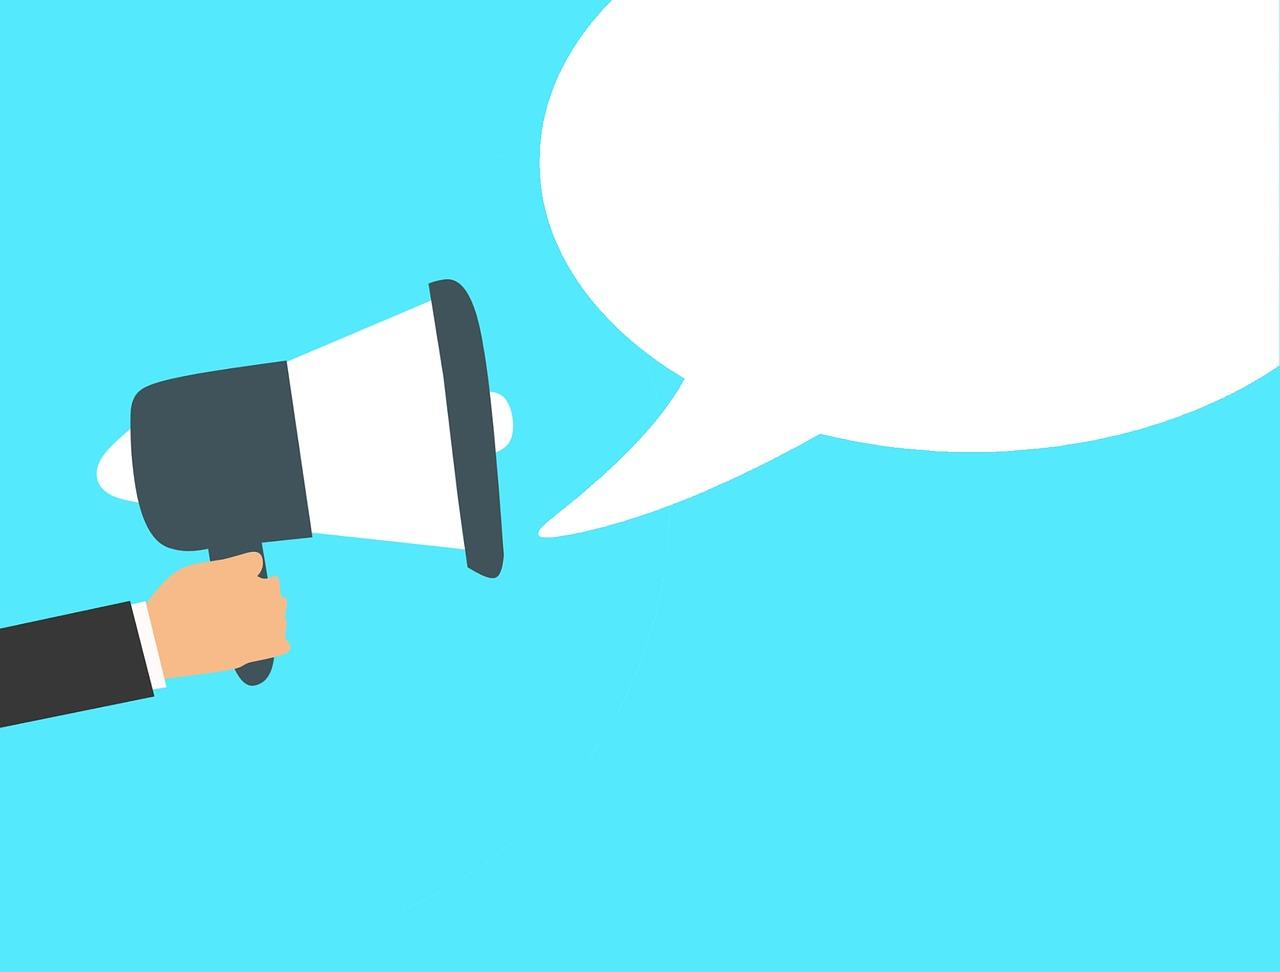 5 Traditional Marketing Tactics That Still Work